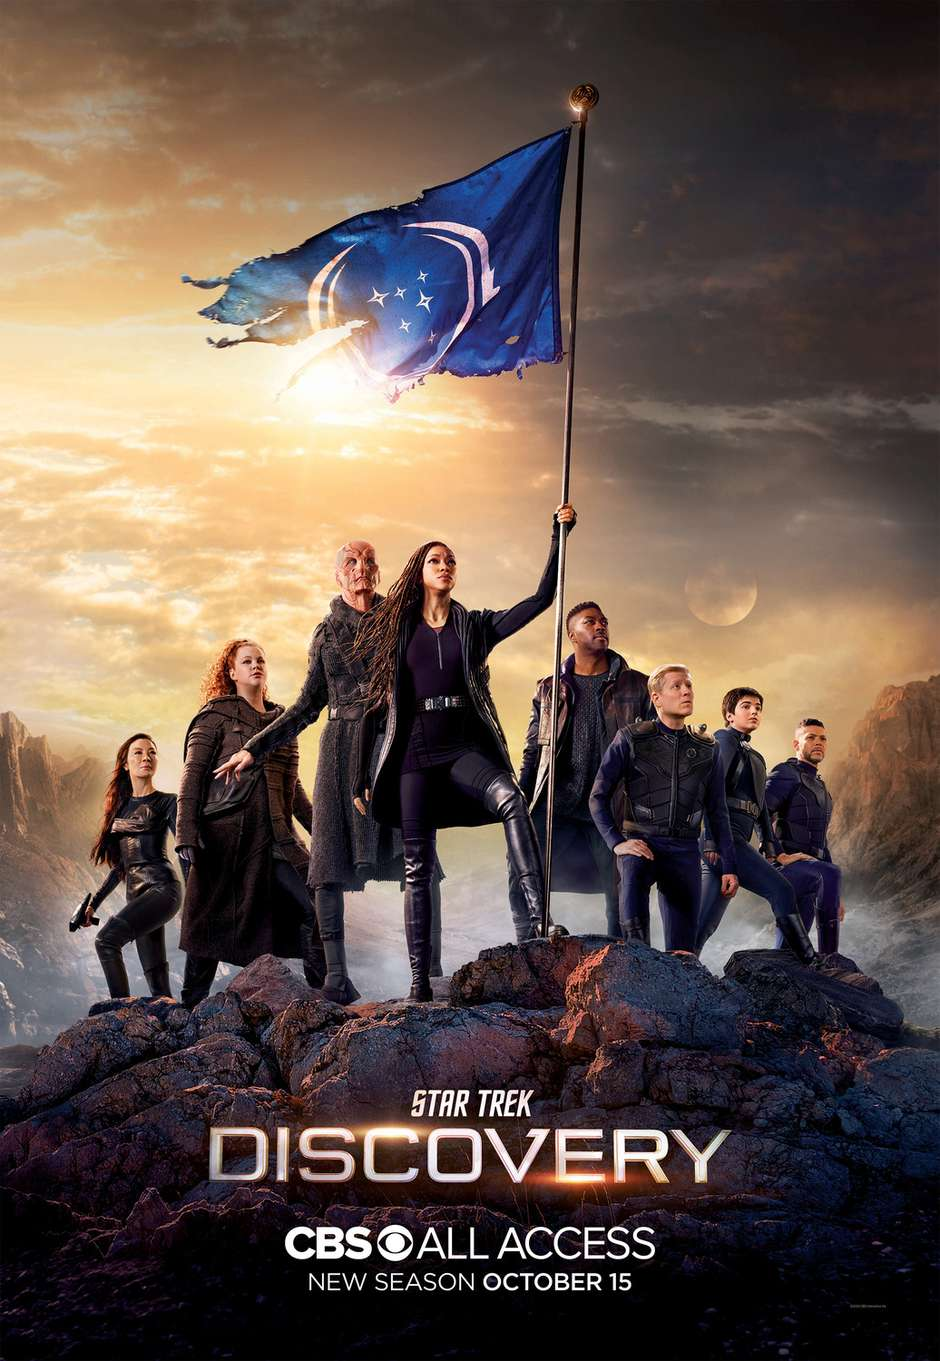 star trek discovery 3 temporada - STAR TREK: DISCOVERY renovada para a 4ª temporada